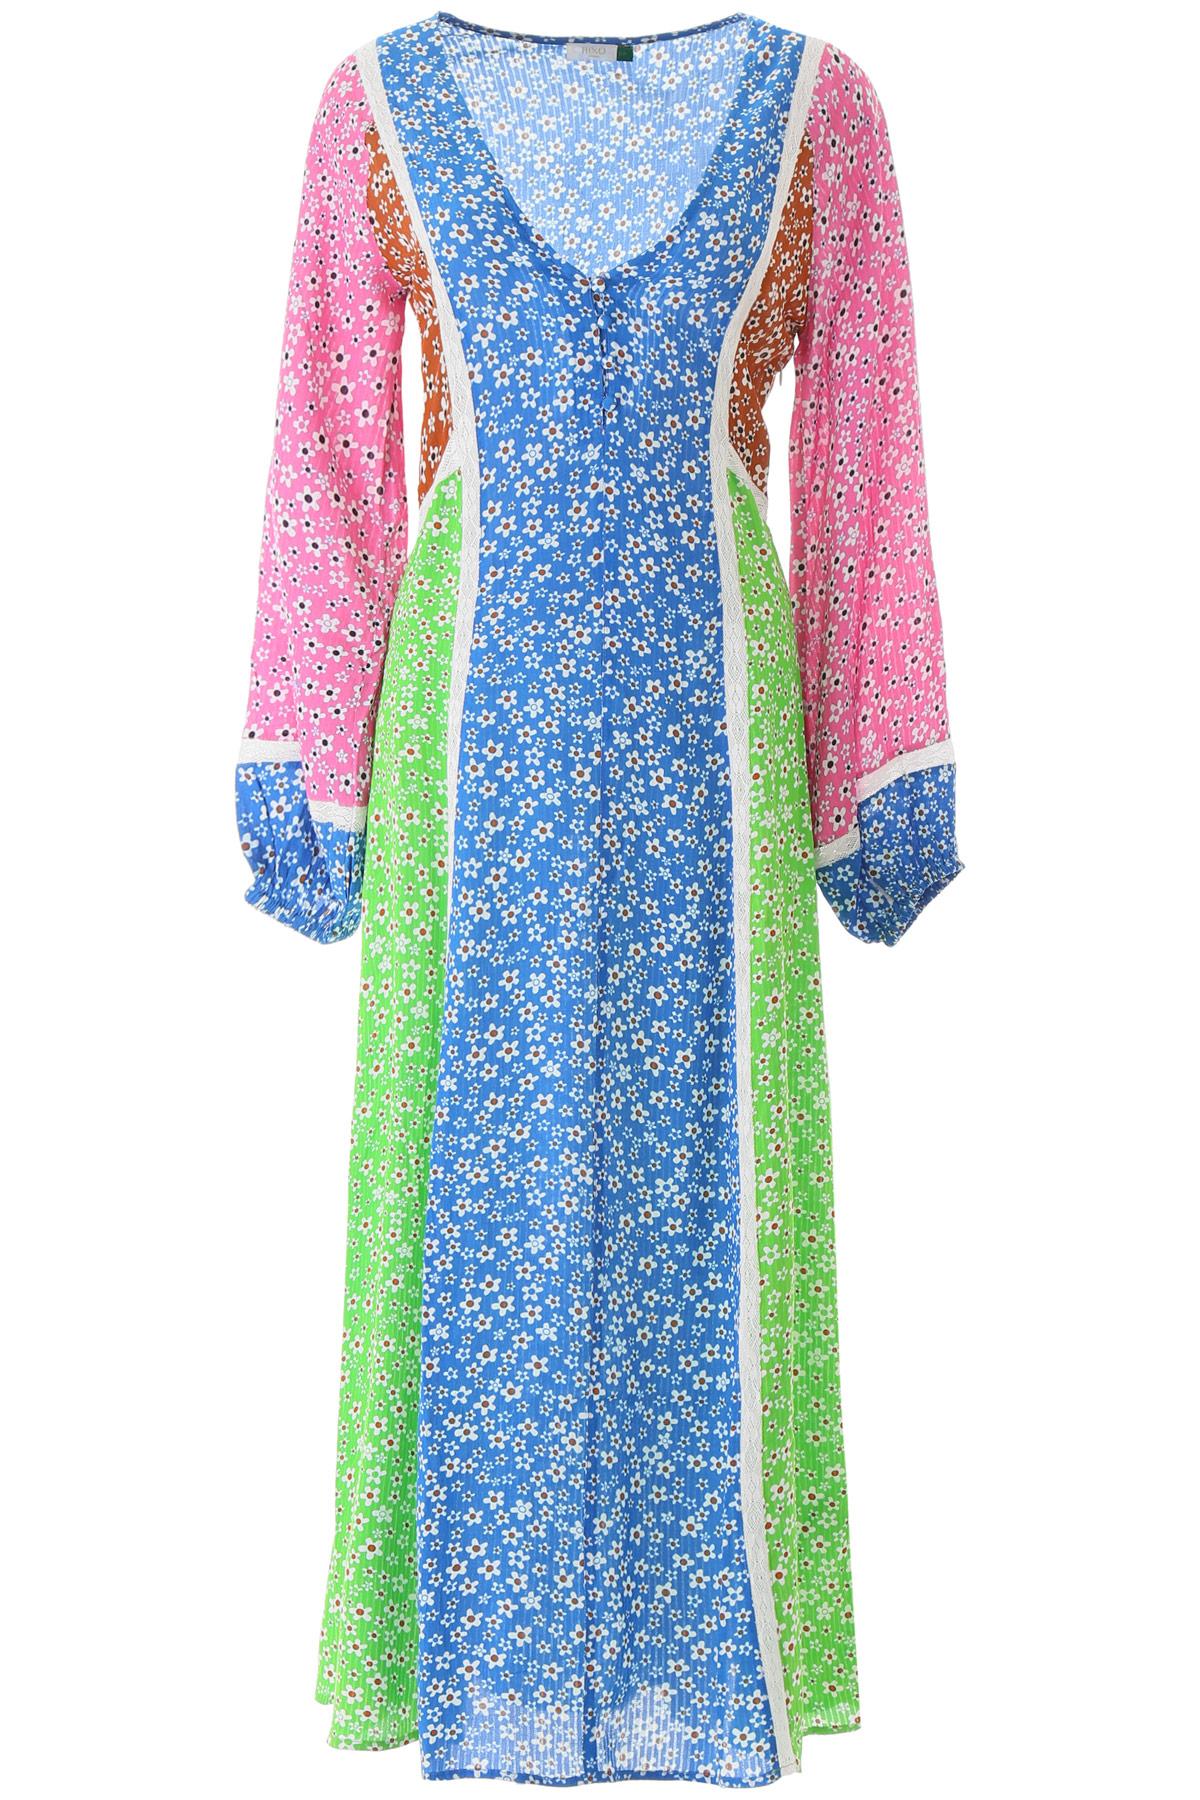 RIXO LONDON NIKKI FLORAL DRESS M Blue, Green, Pink